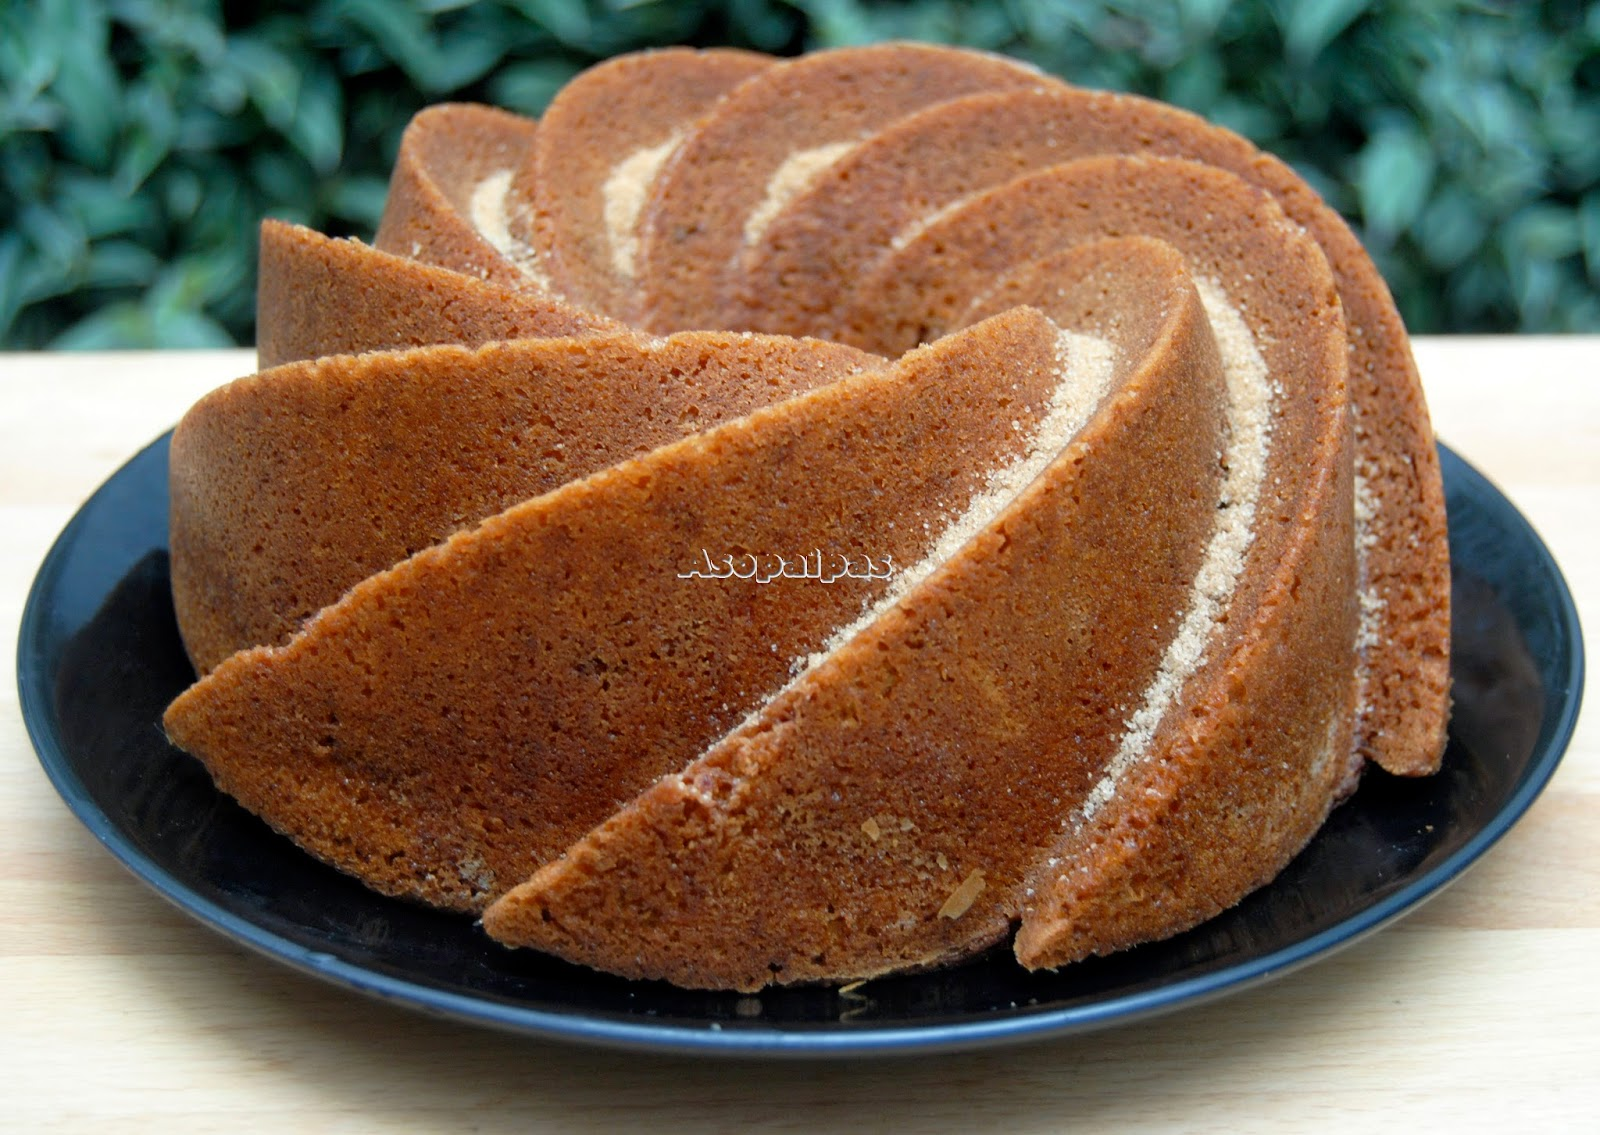 http://www.asopaipas.com/2014/05/snickerdoodle-bundt-cake.html